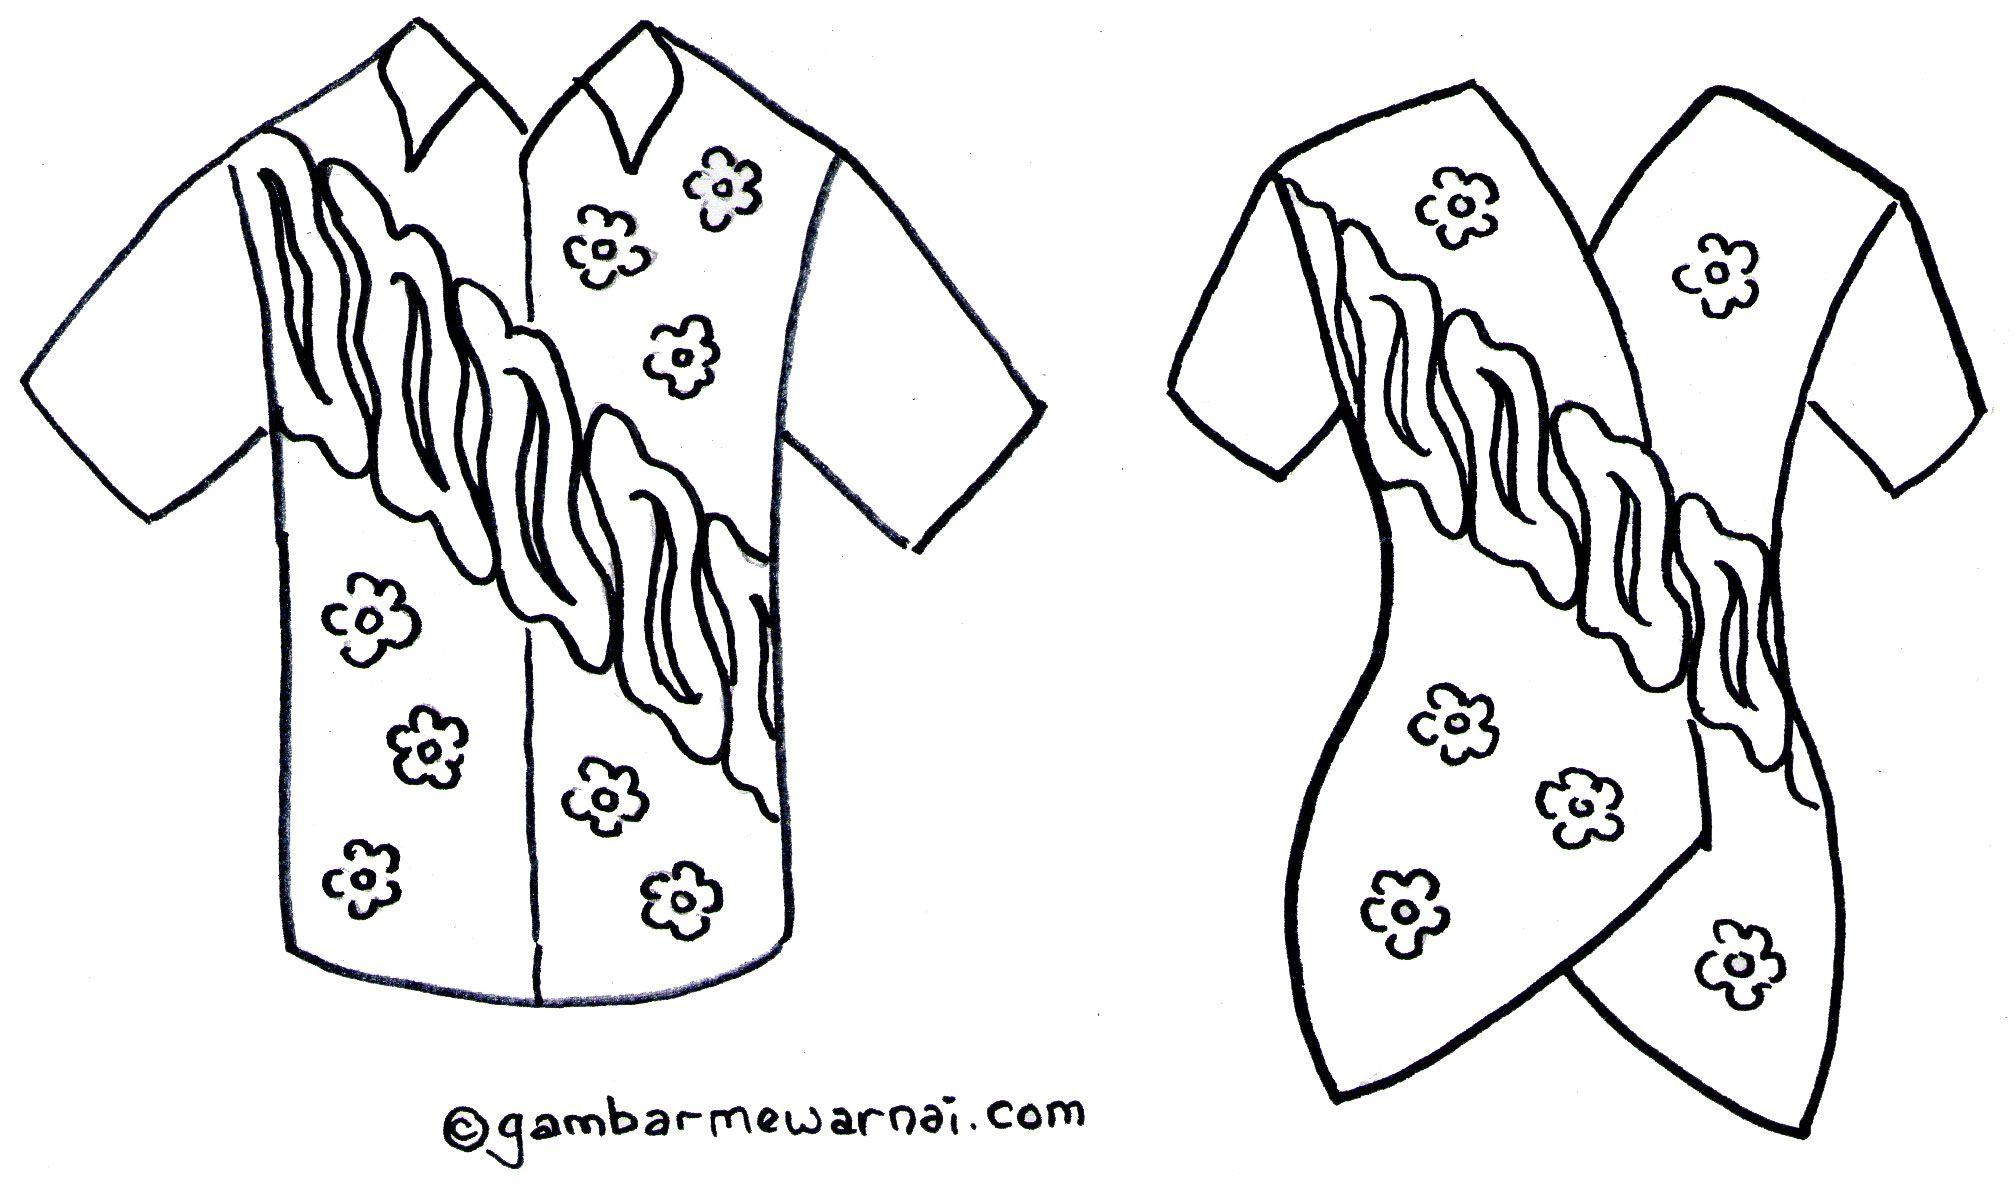 Gambar Mewarnai Baju Batik Buku Mewarnai Warna Gambar